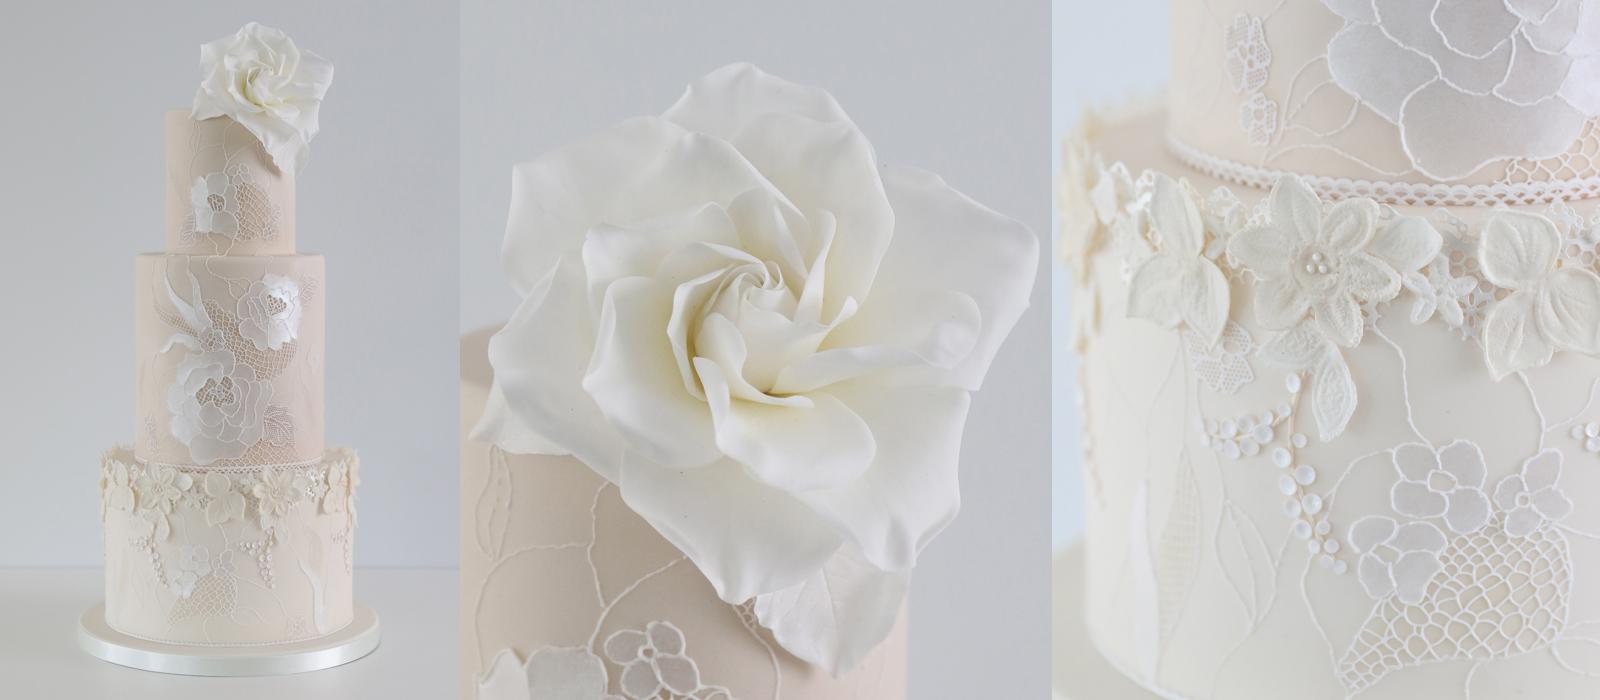 Gardenia Lace Wedding Cake Class